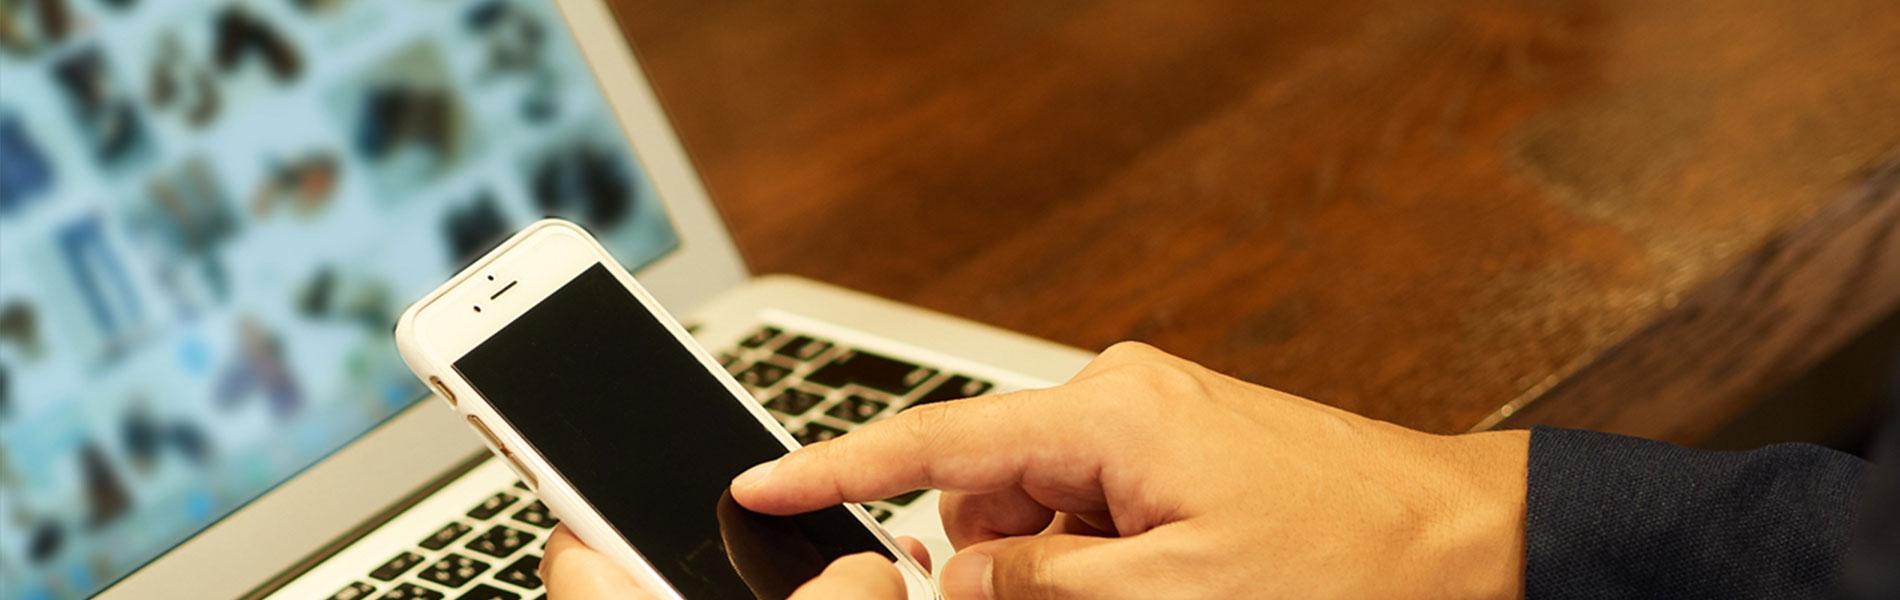 WEBサイト制作&管理